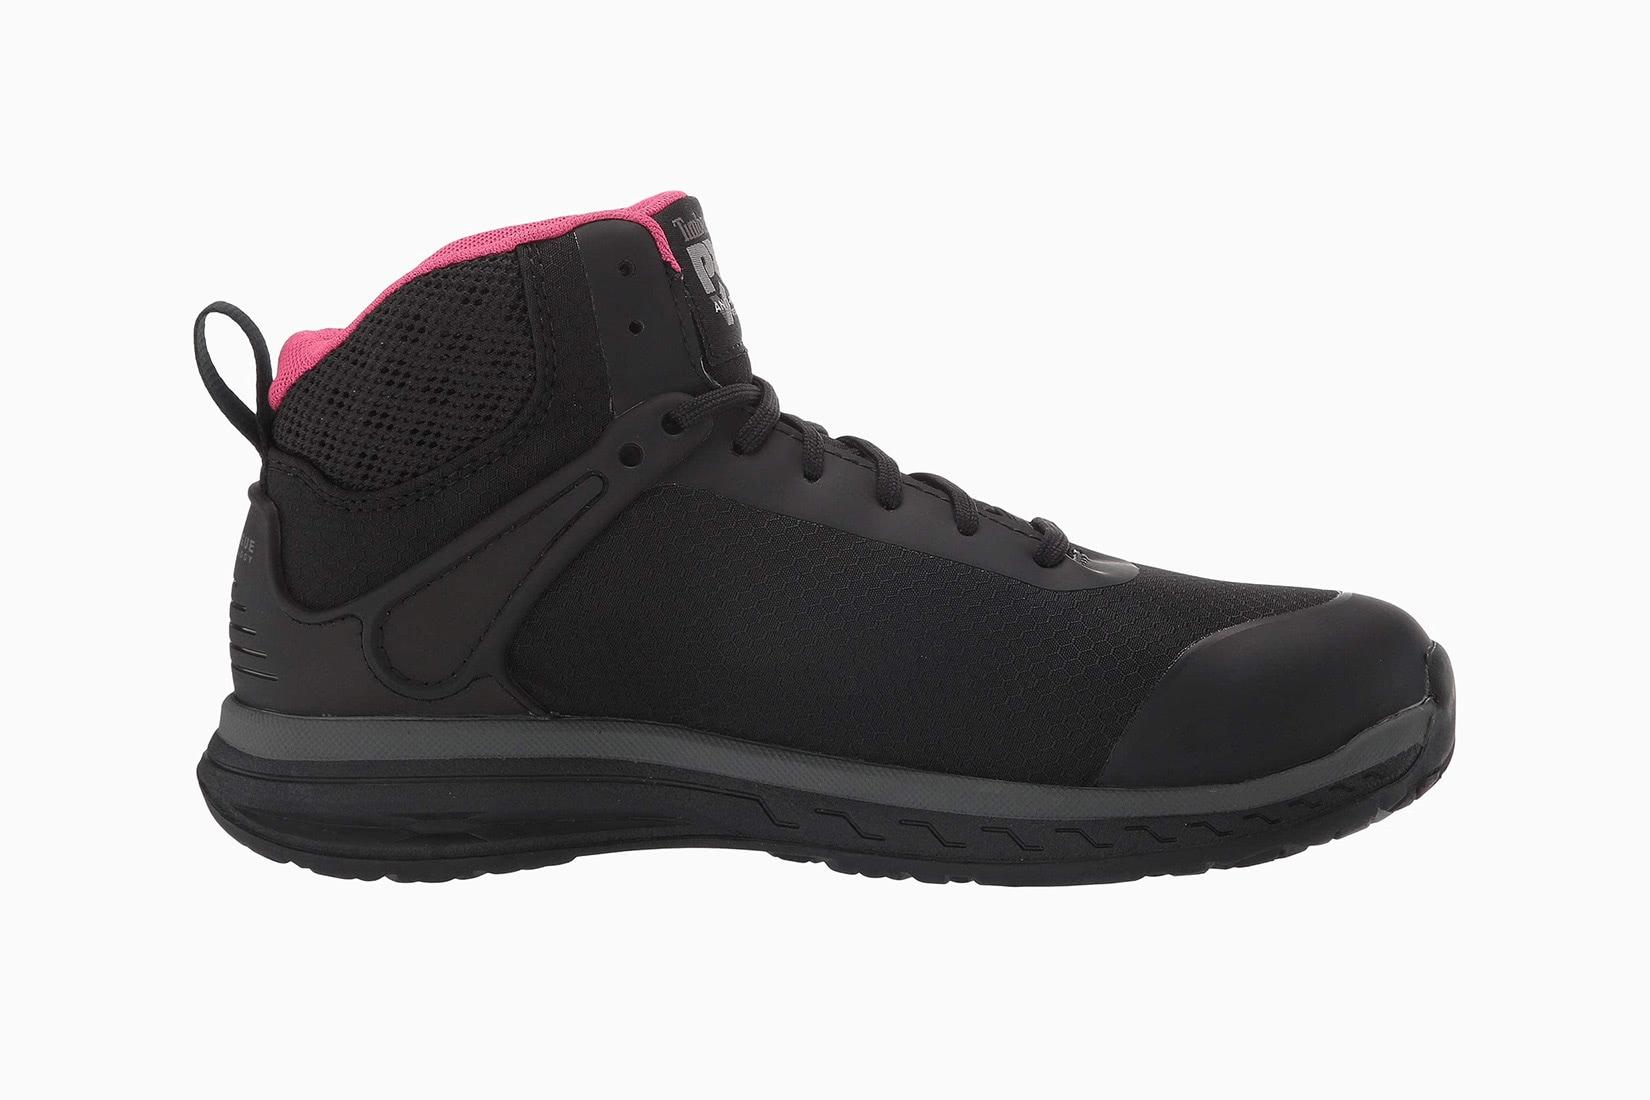 best women walking shoes timberland PRO drivetrain hiking boots - Luxe Digital